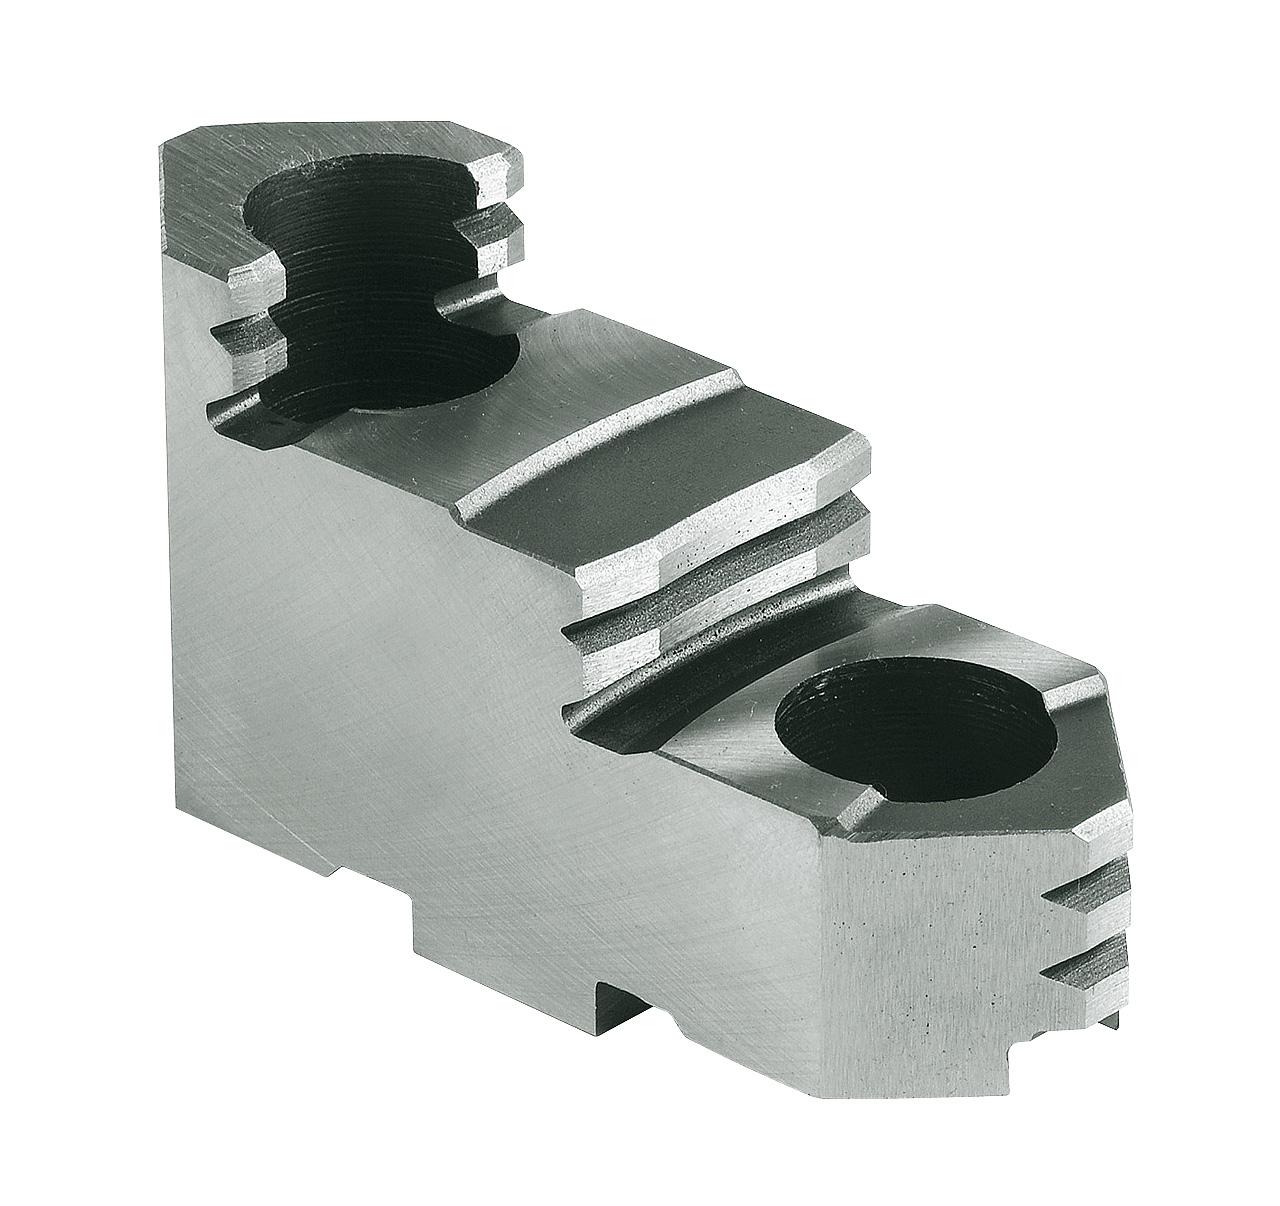 Szczęki górne twarde - komplet DTJ-DK11-125 BERNARDO